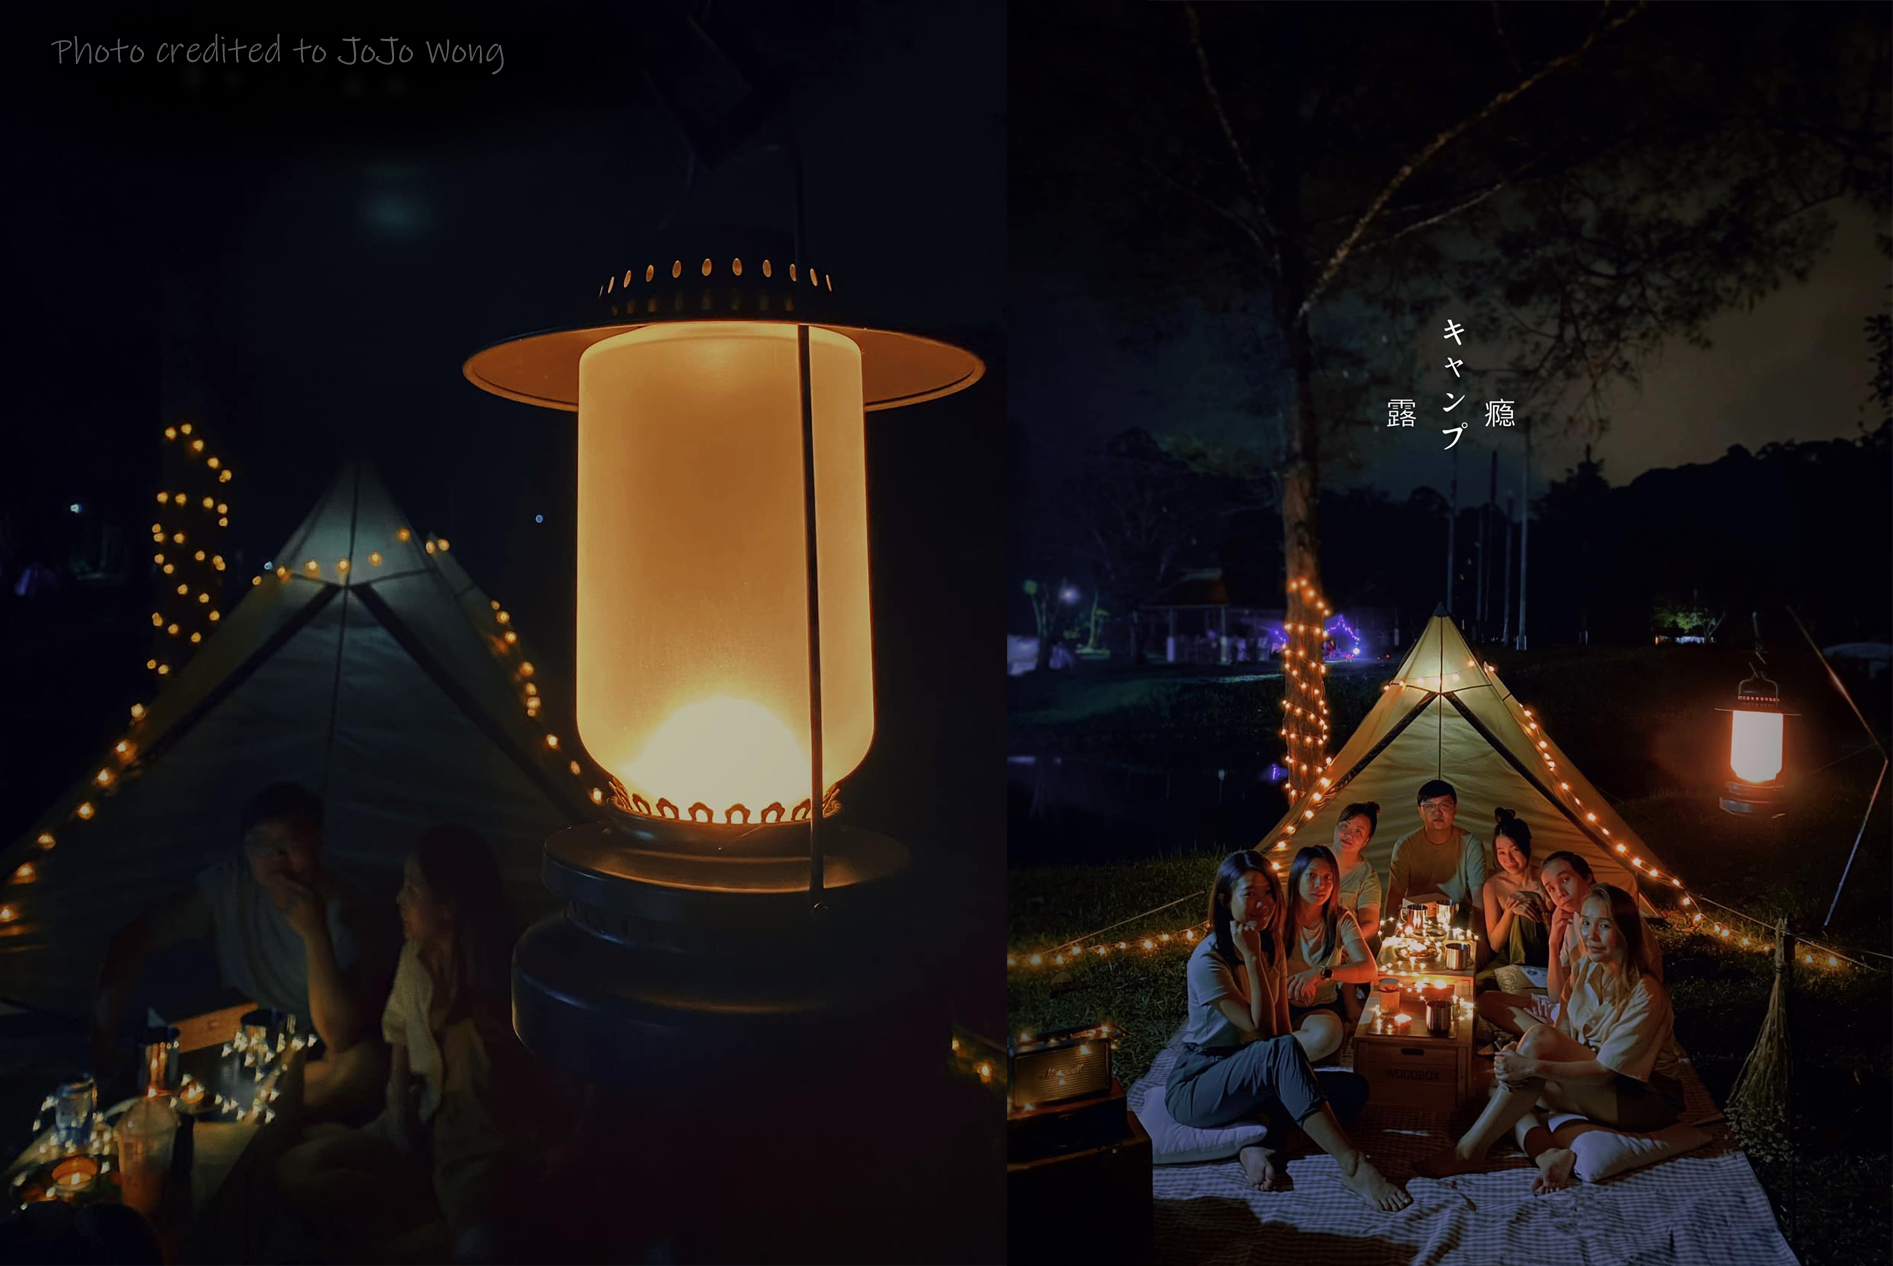 Resort_Taman_Rimba_Komanwel_Rawang_campsite_malaysia_car_camping_private_event_organizer-7